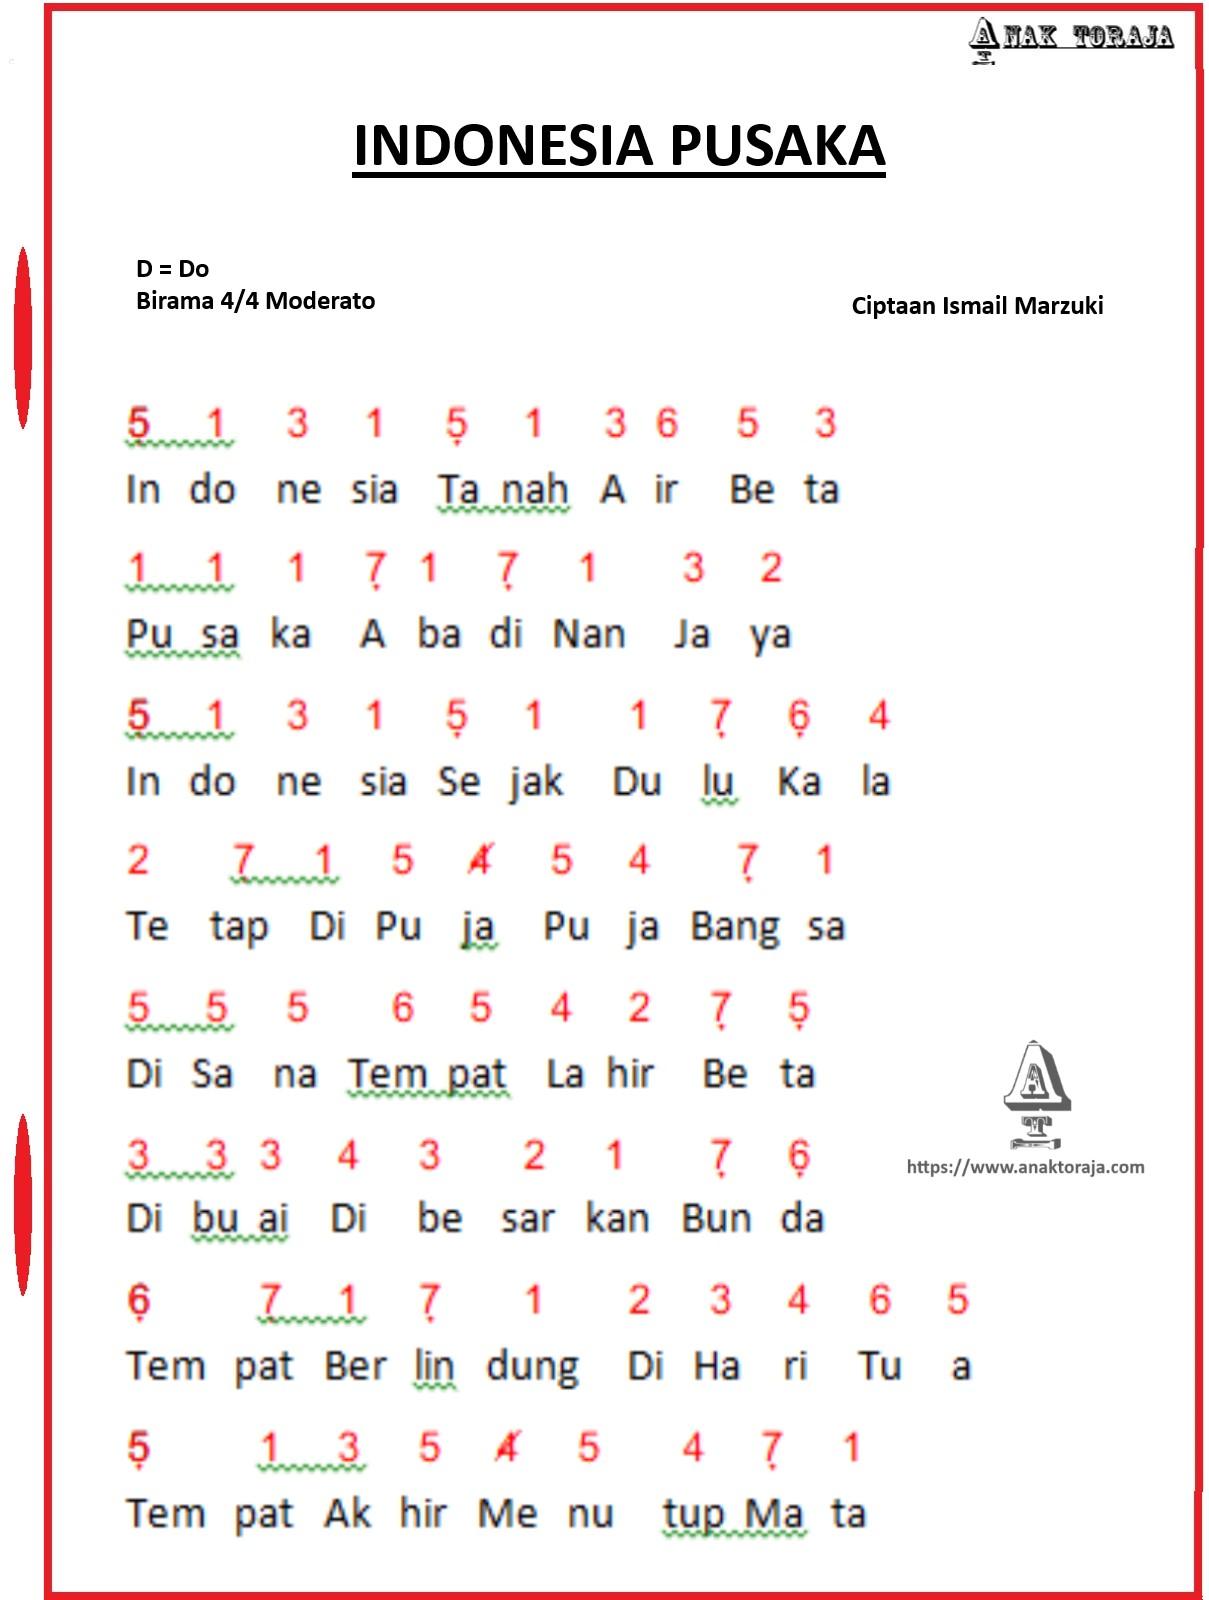 Syair Lagu Indonesia Pusaka : syair, indonesia, pusaka, Angka, Indonesia, Pusaka